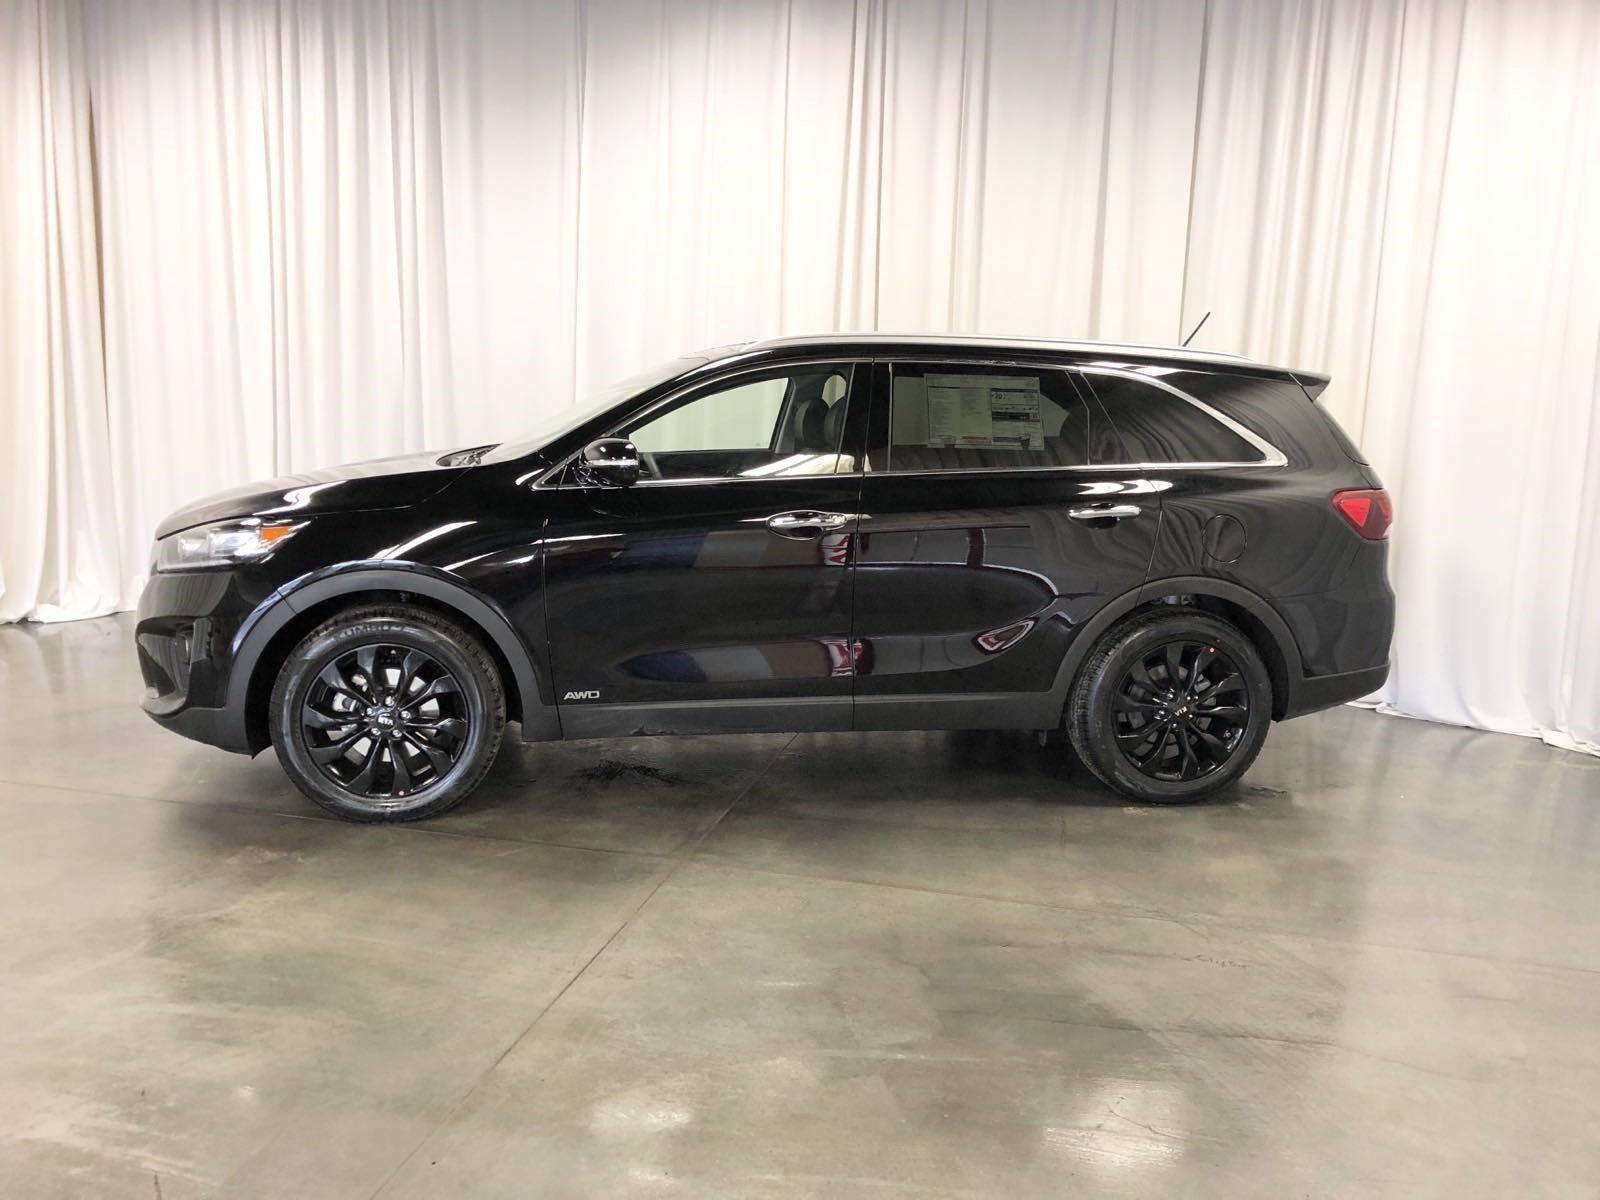 New 2020 Kia Sorento EX V6 Sport Utility for sale in St Joseph MO